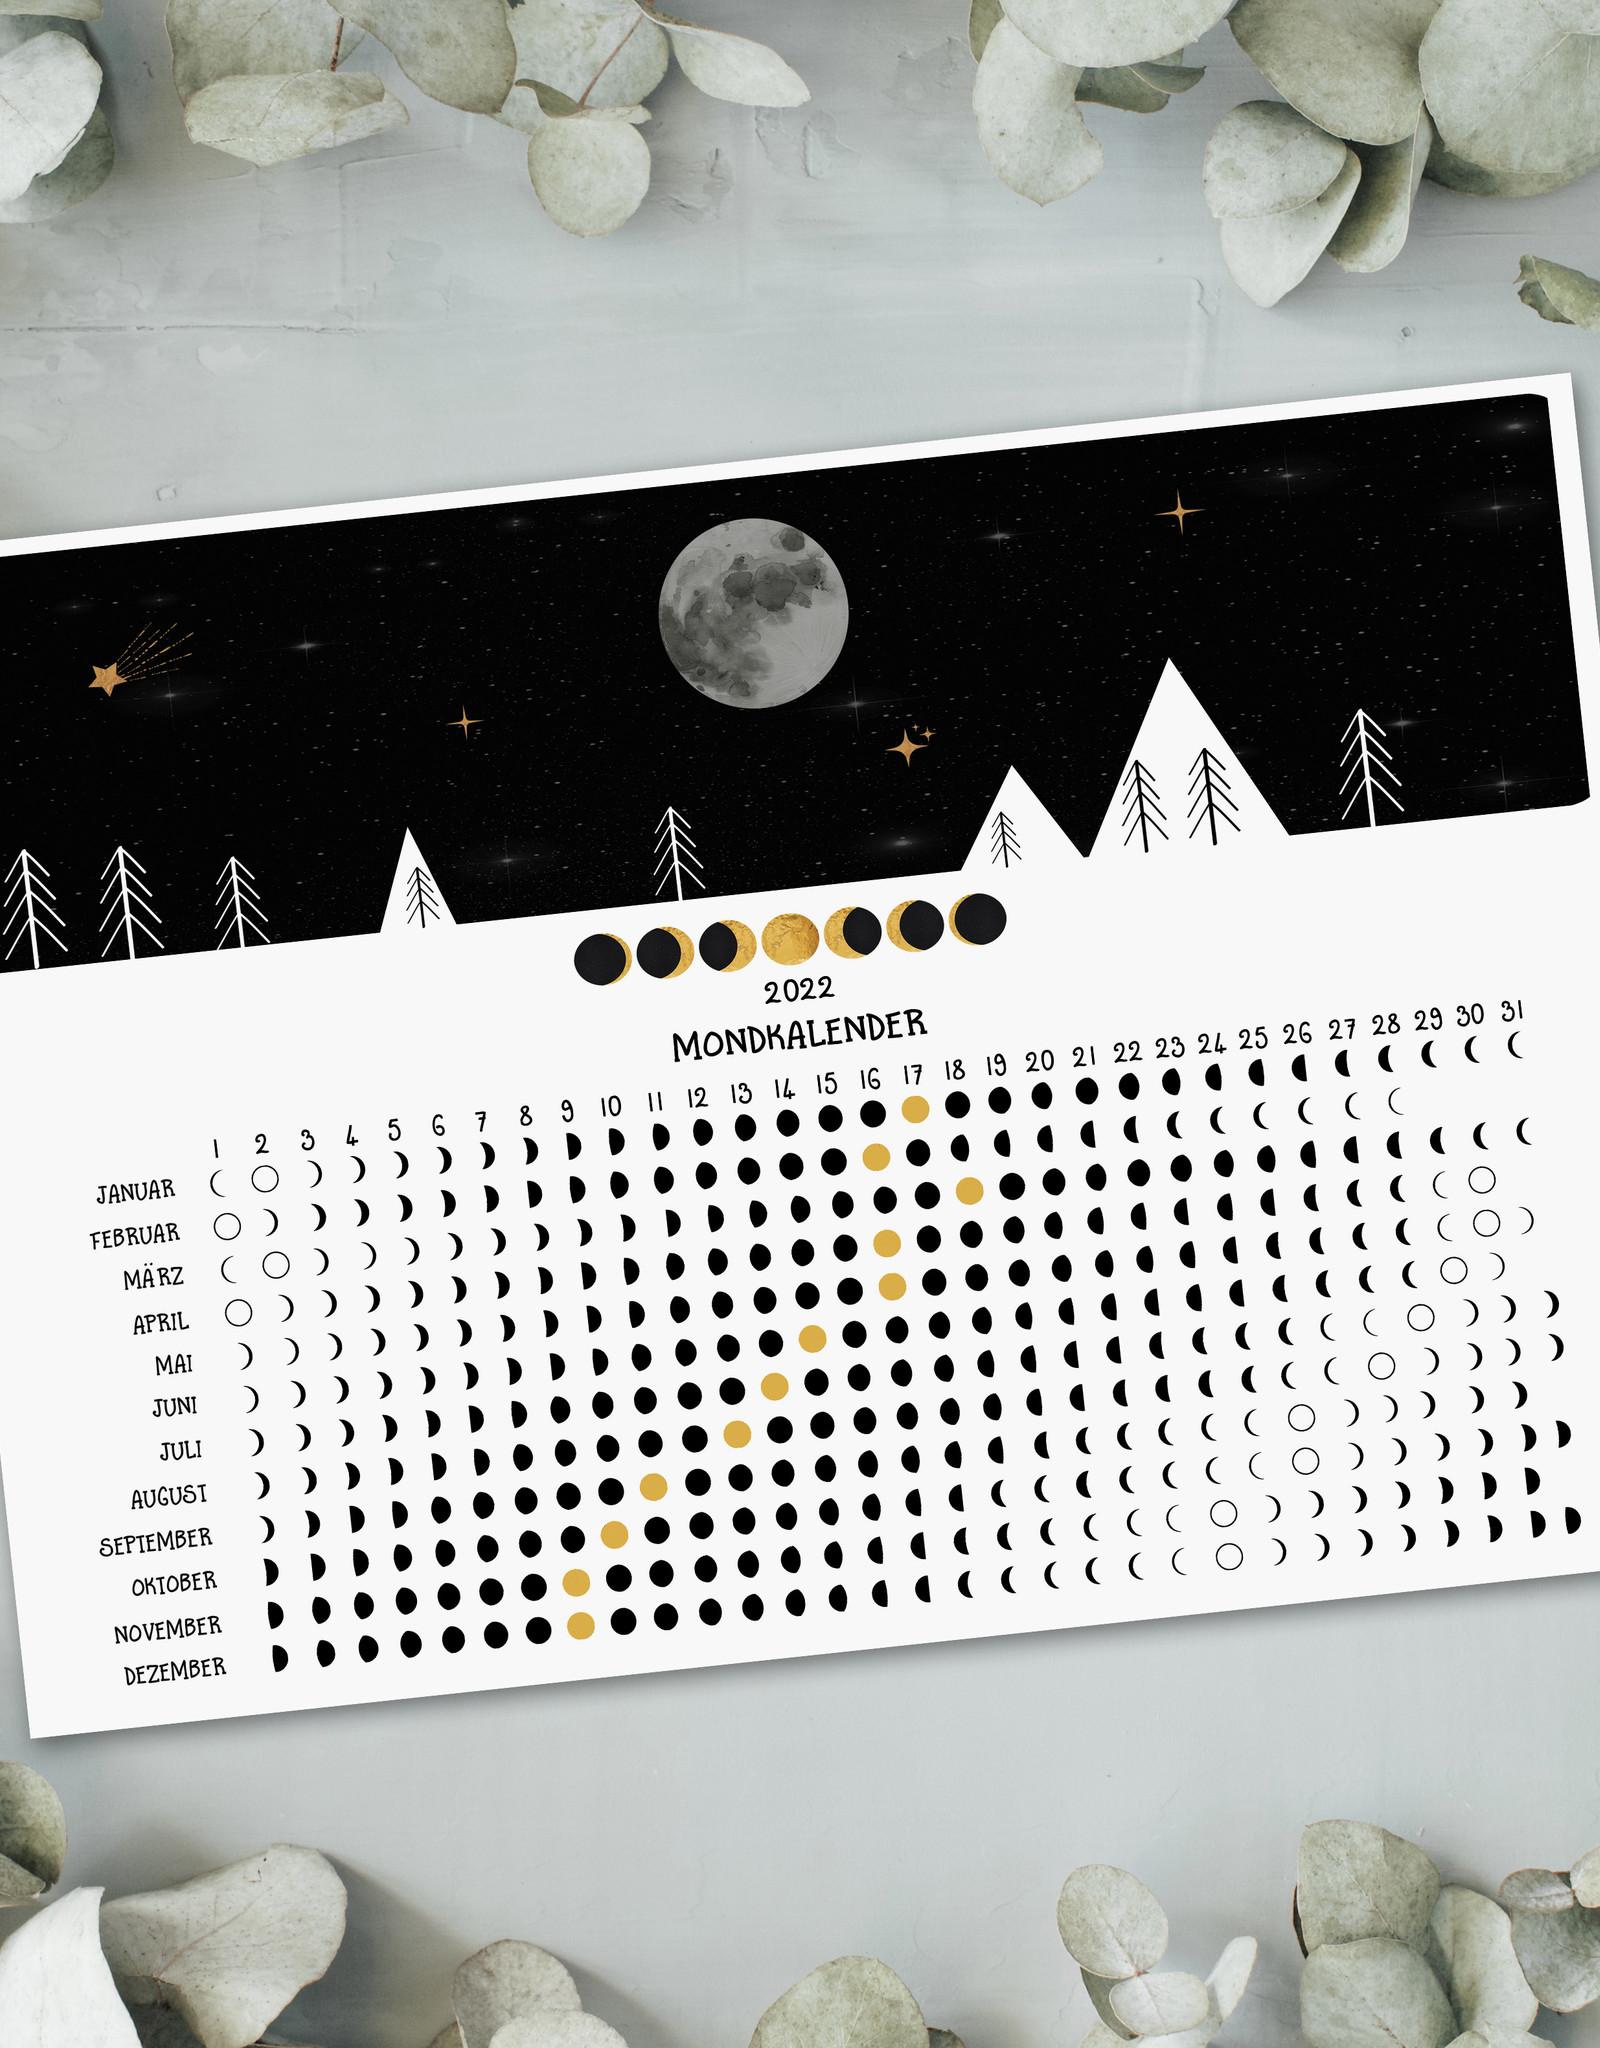 Postkarte Mondkalender 2022 DIN A6 Grußkarte Mond Kalender Postkarte